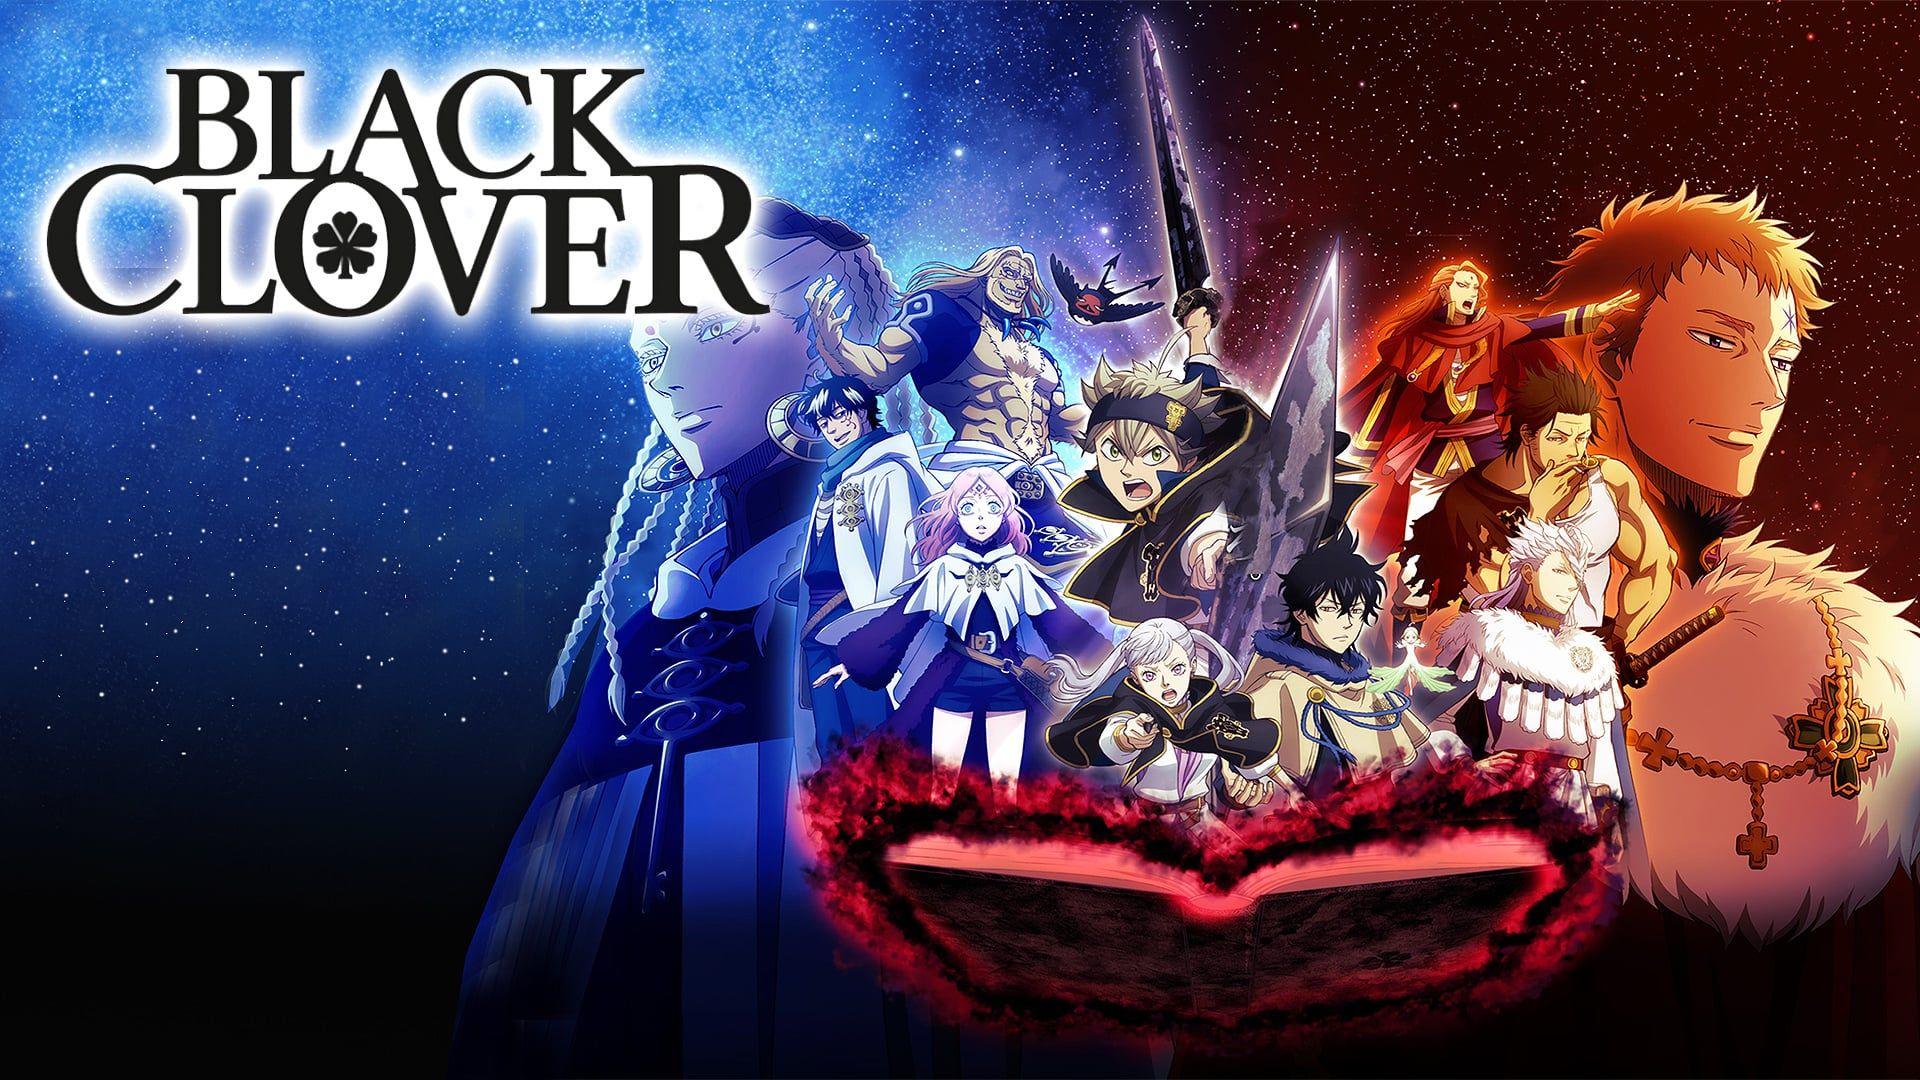 Black Clover Episode 160: Release Date, Story & Watch Online